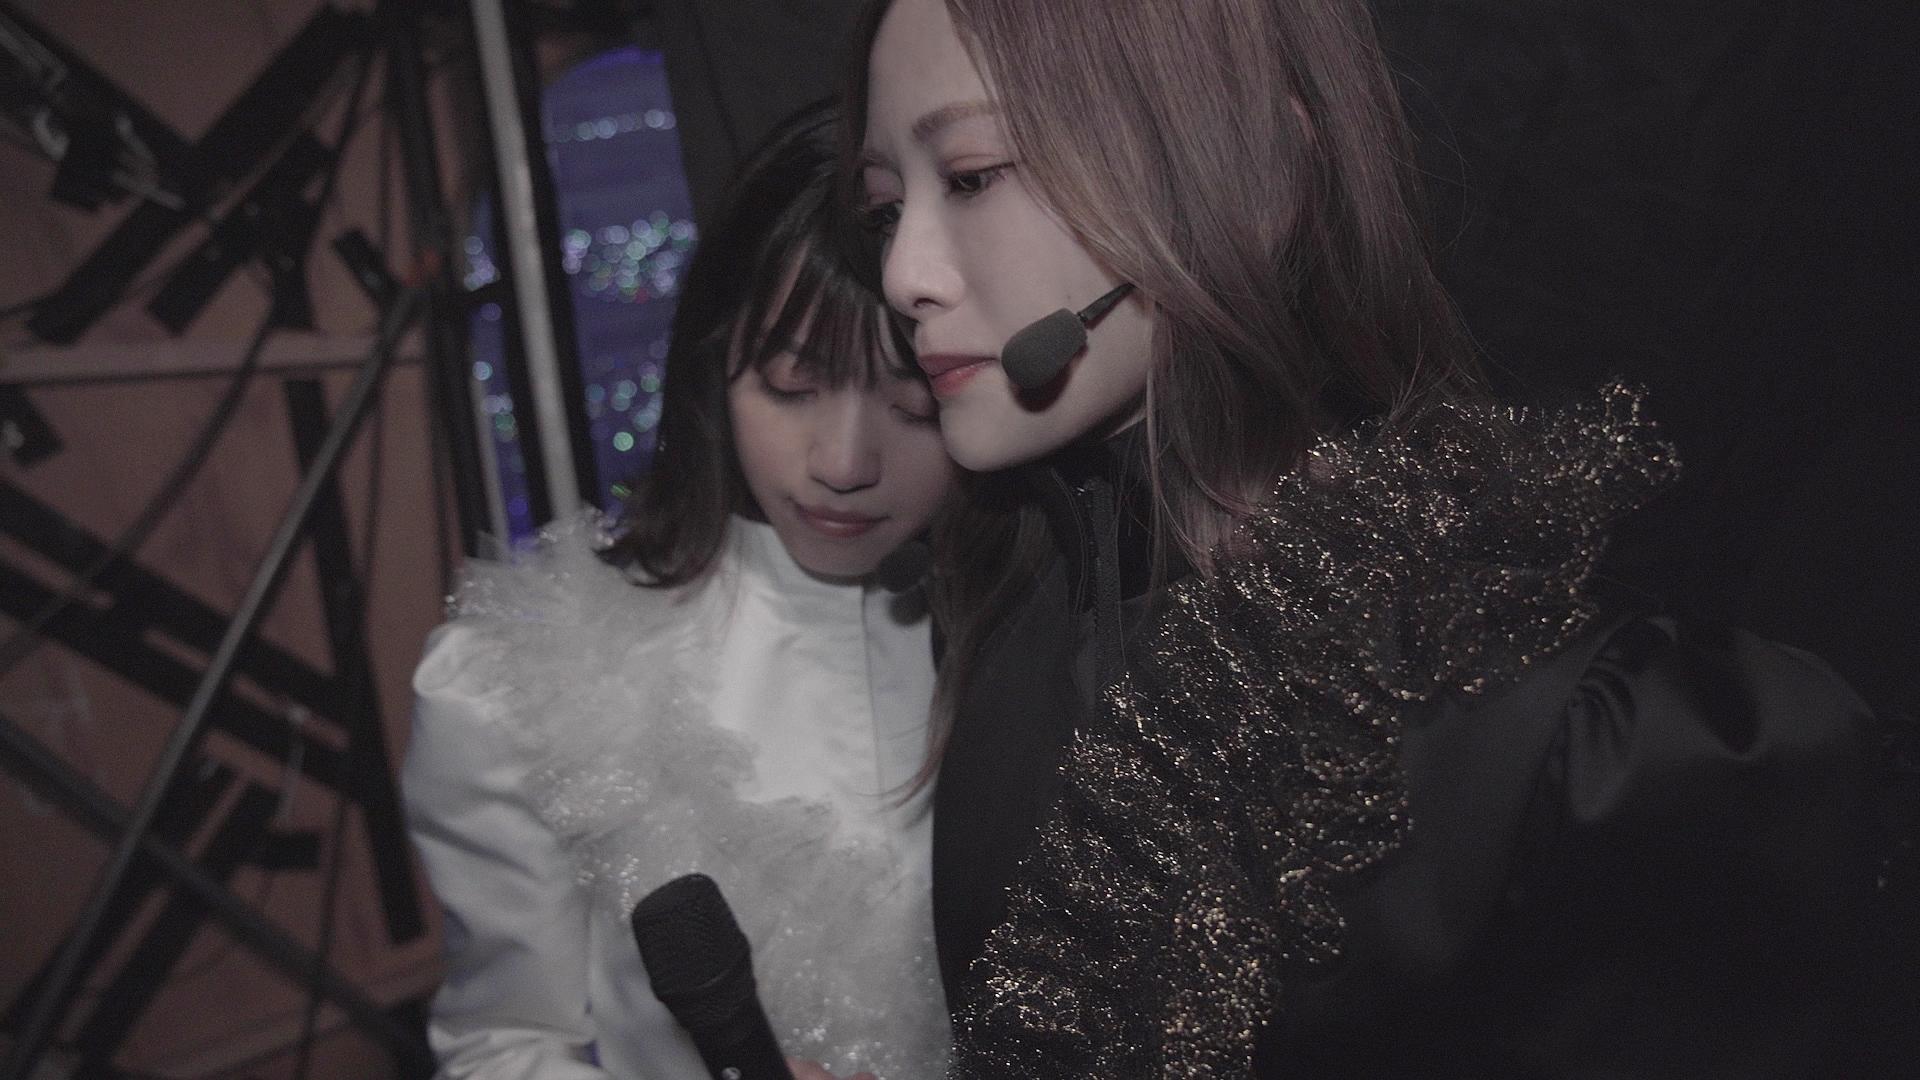 映画『Documentary of 乃木坂46 Ⅱ(仮題)』 (C)2019「DOCUMENTARY of 乃木坂46」製作委員会